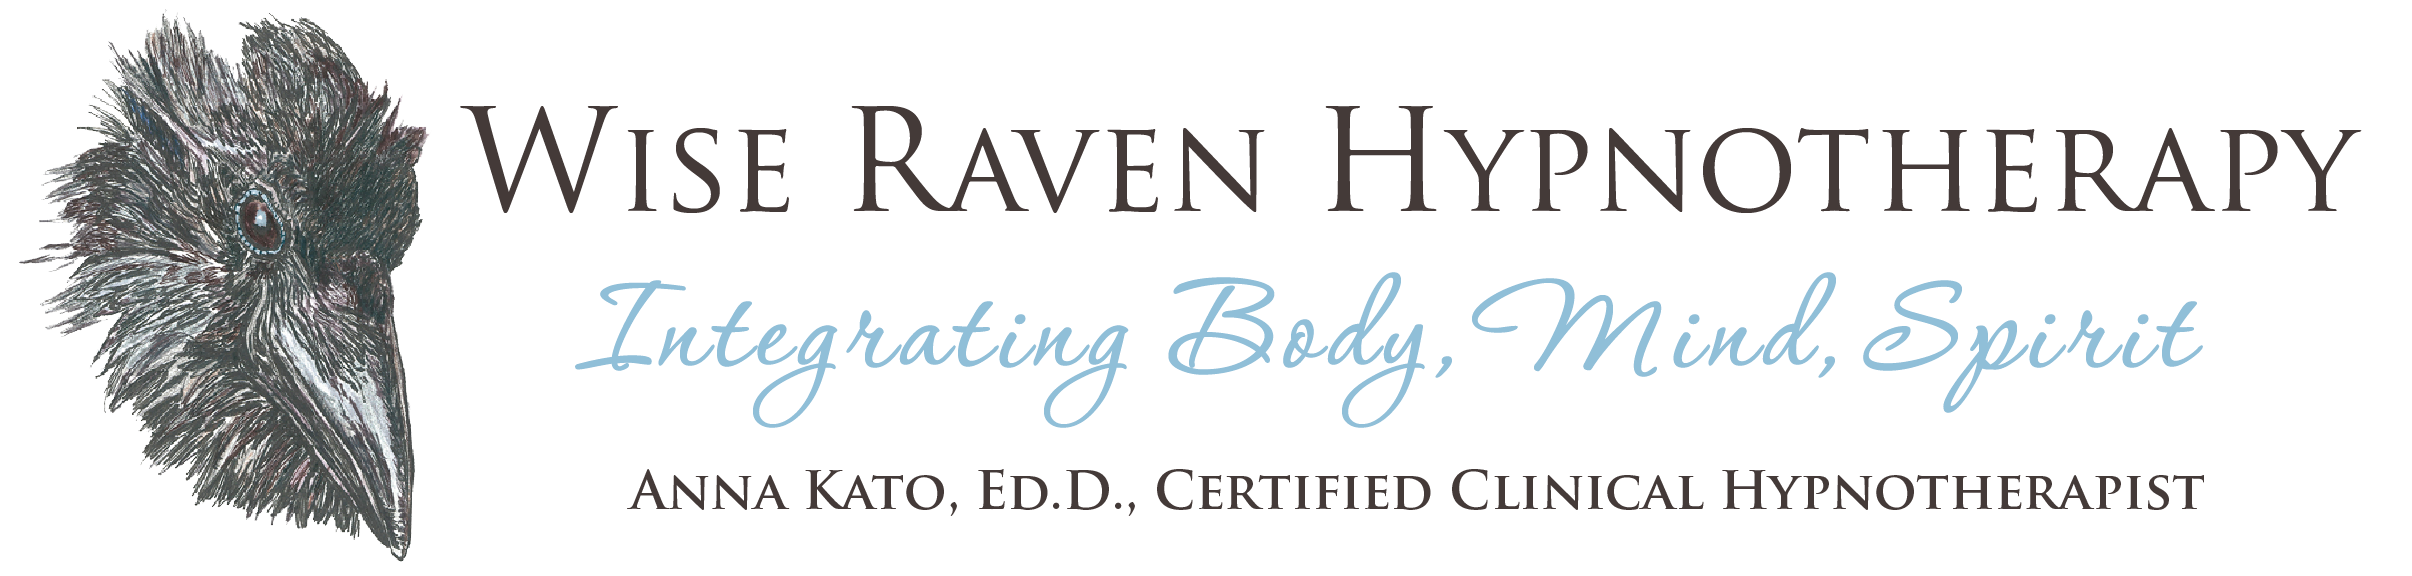 Wise Raven Hypnotherapy — A Sacramento hypnotherapist